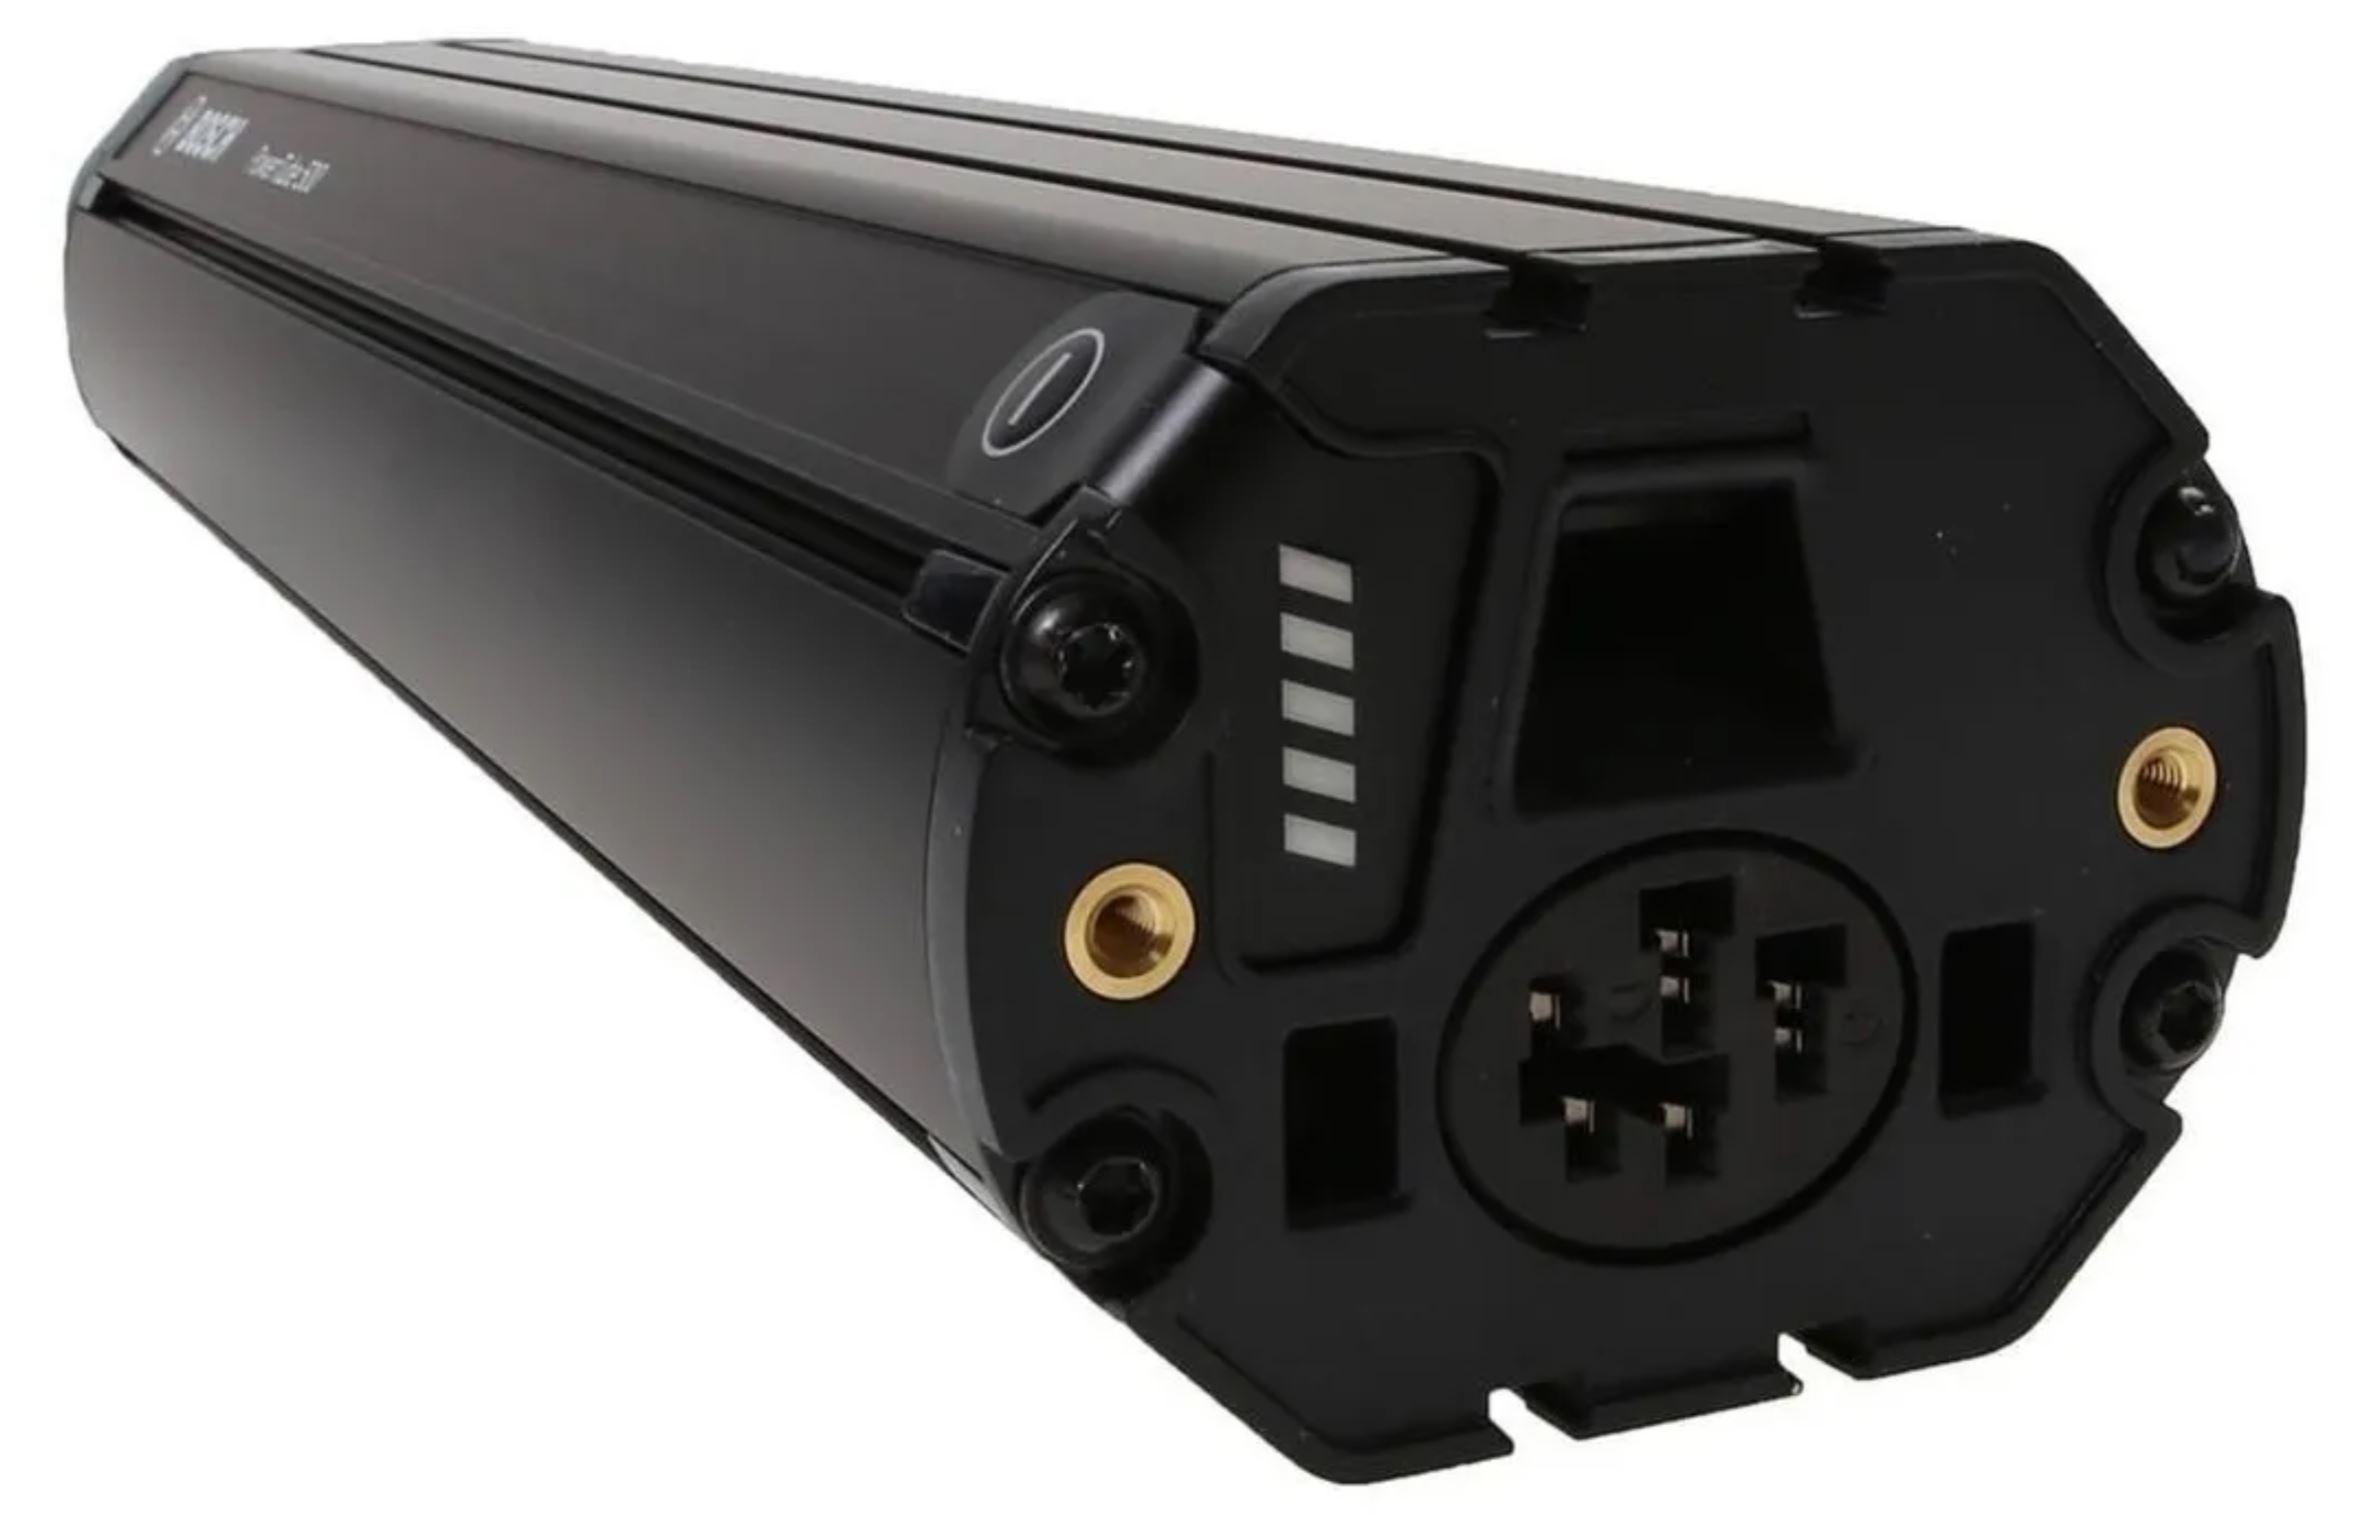 Bateria Bosch Powertube 500 horizontal MX 2021 Polanco